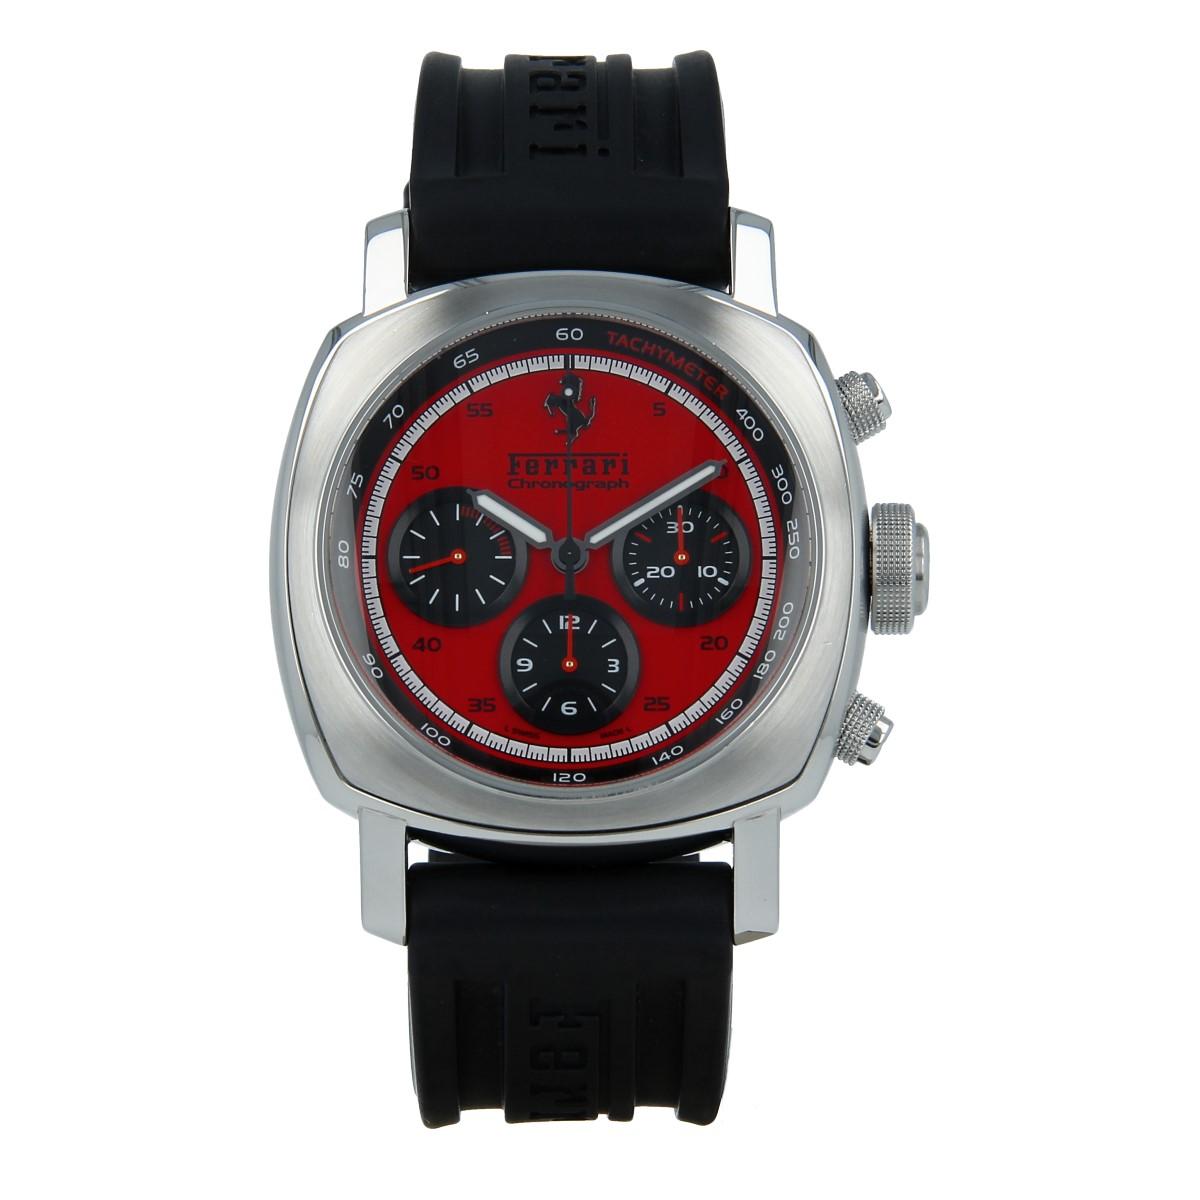 Panerai Ferrari Granturismo Chronograph Red Buy Pre Owned Panerai Watch